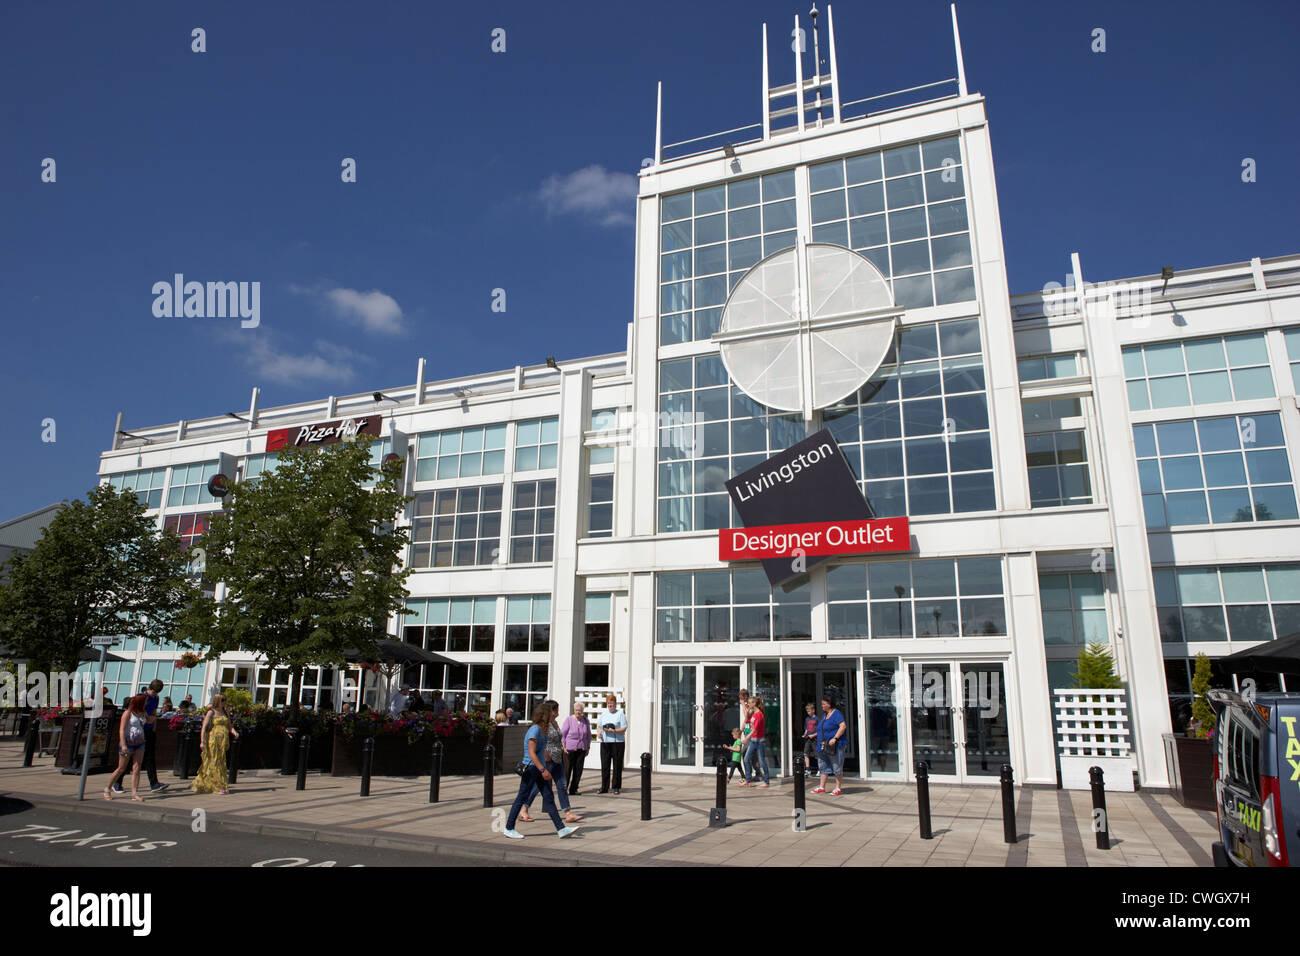 mcarthur glen designer outlet Livingston, Scotland, uk, united kingdom - Stock Image